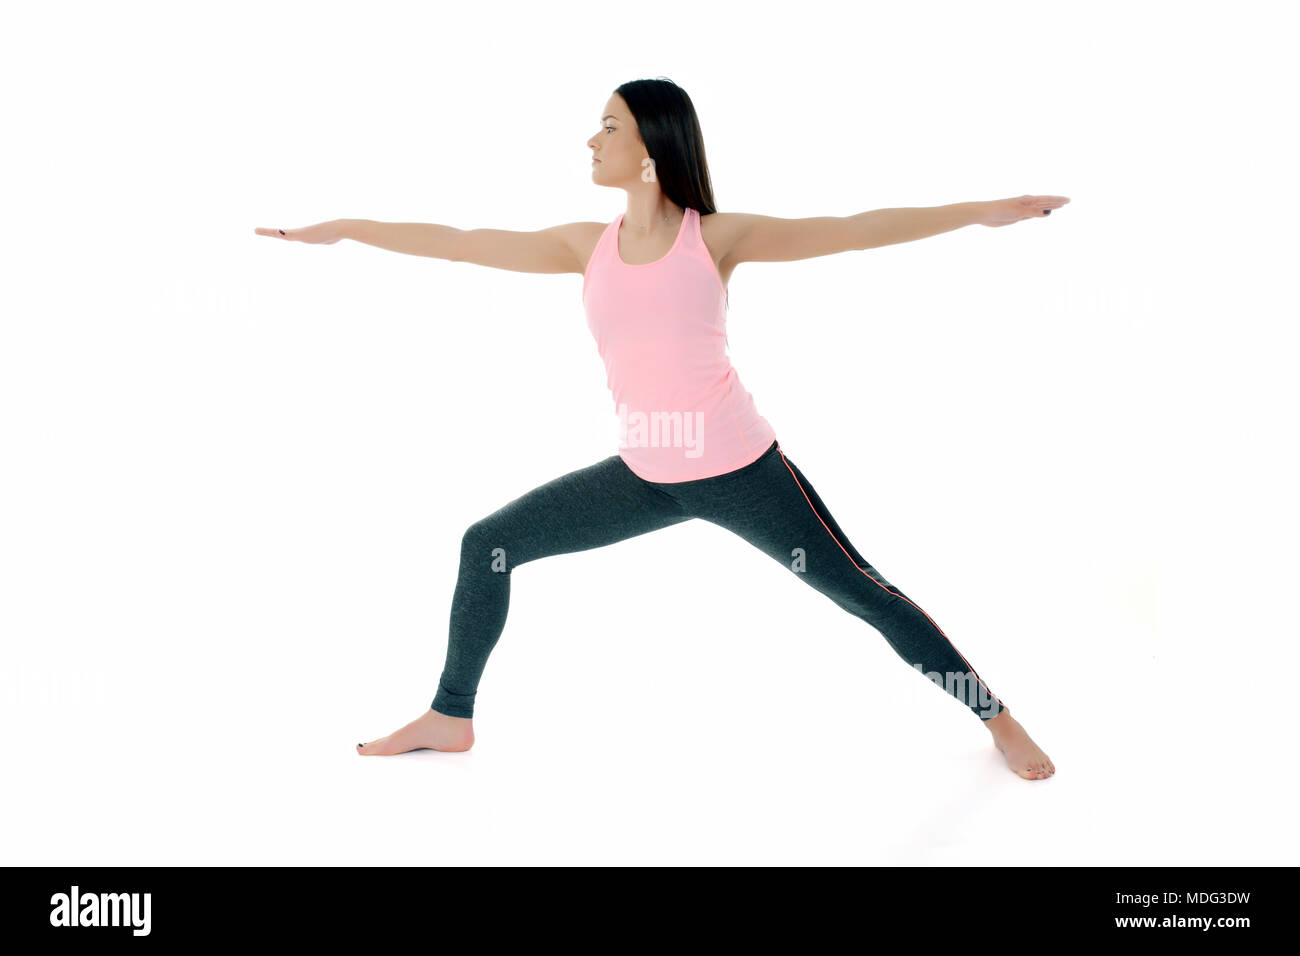 A Young White Girl Performs Yoga Asanas Warrior Pose On Sanskrit Virabradasana